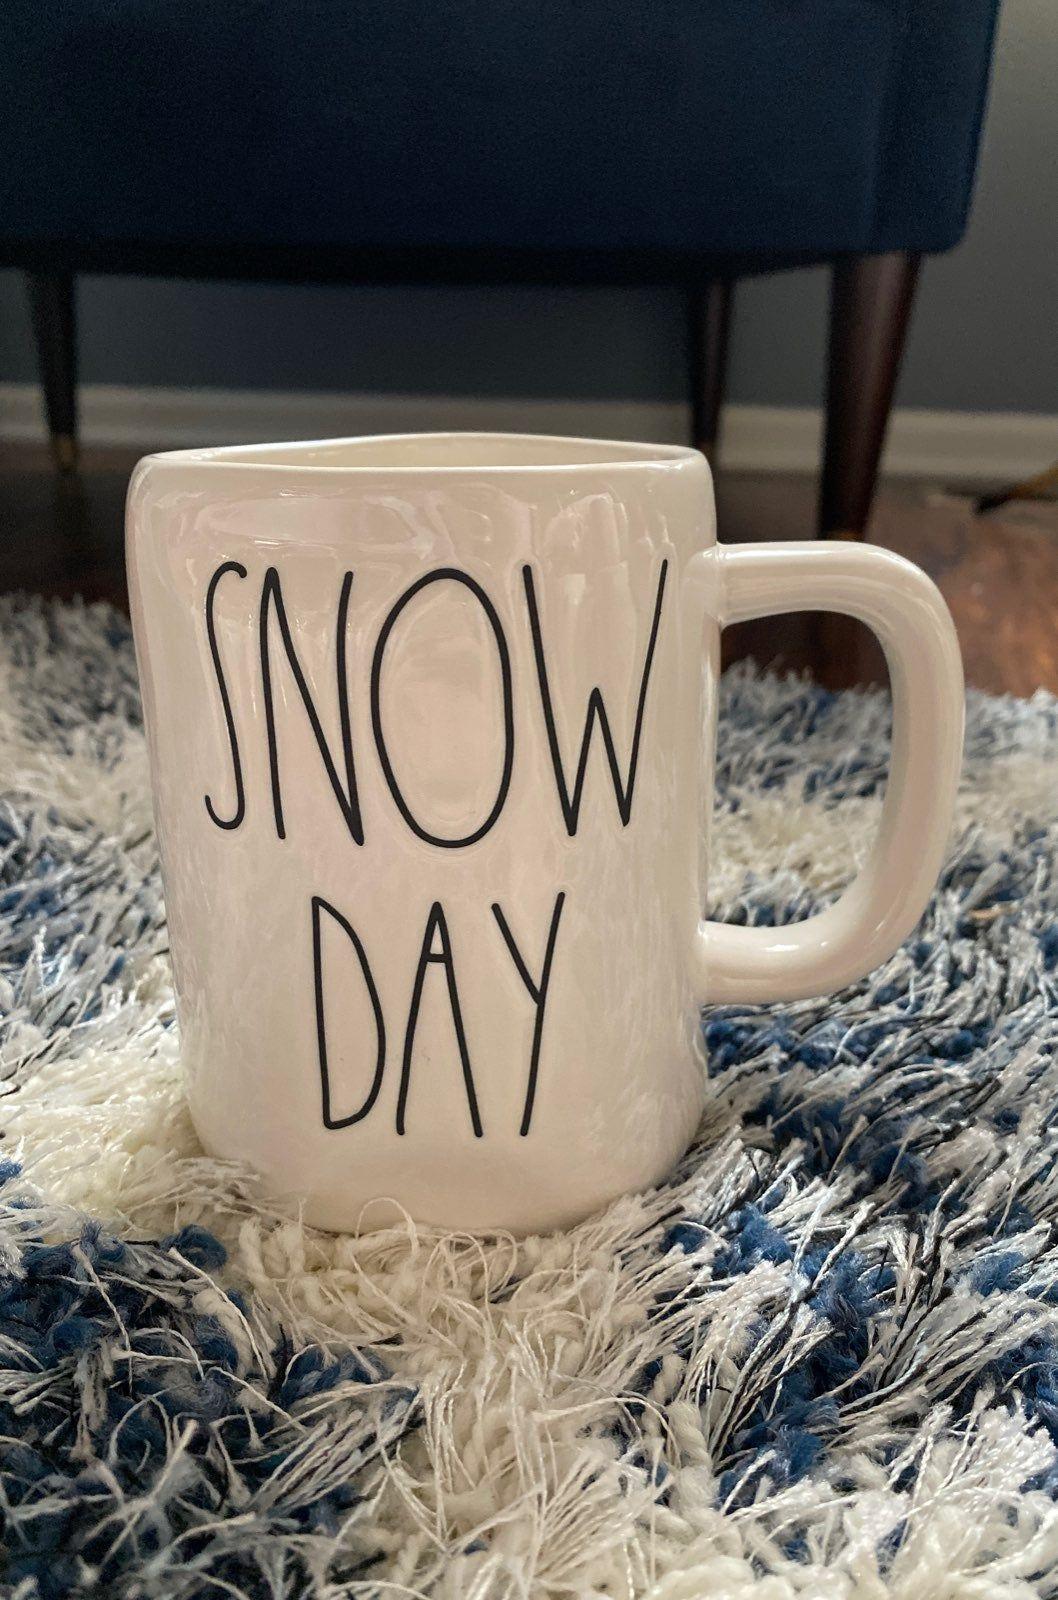 Brand new Rae Dunn snow day mug. Comes from a smoke free